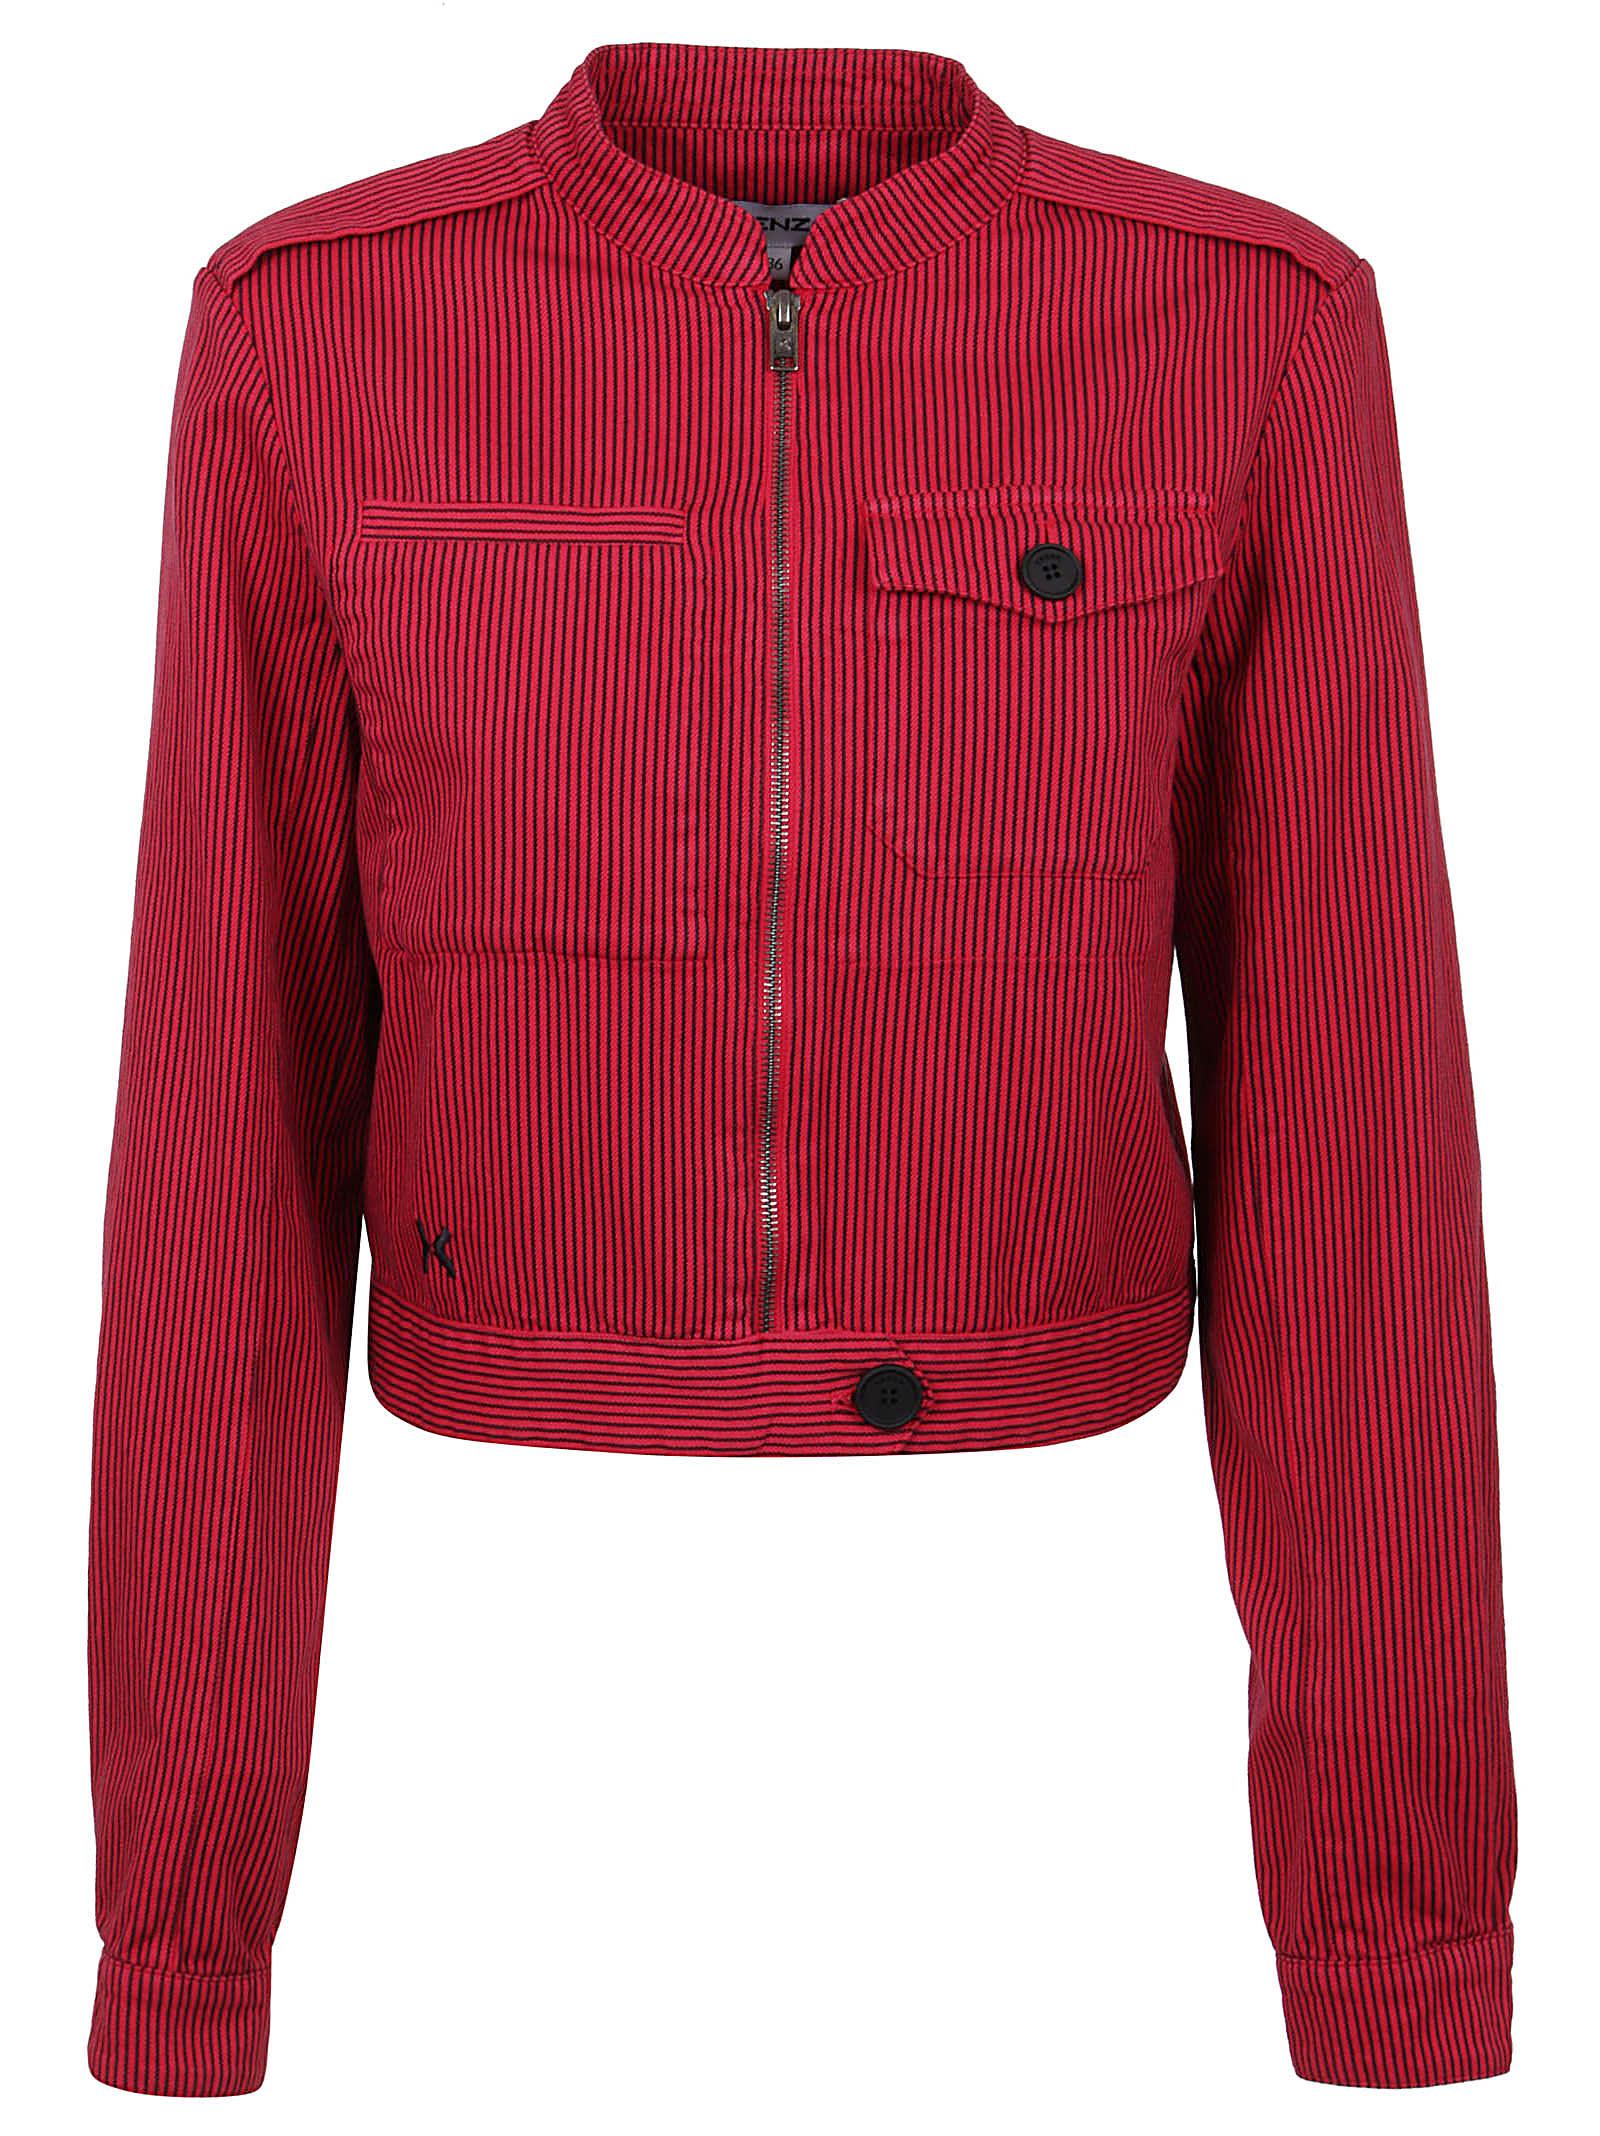 Kenzo Fitted Blouson Jacket